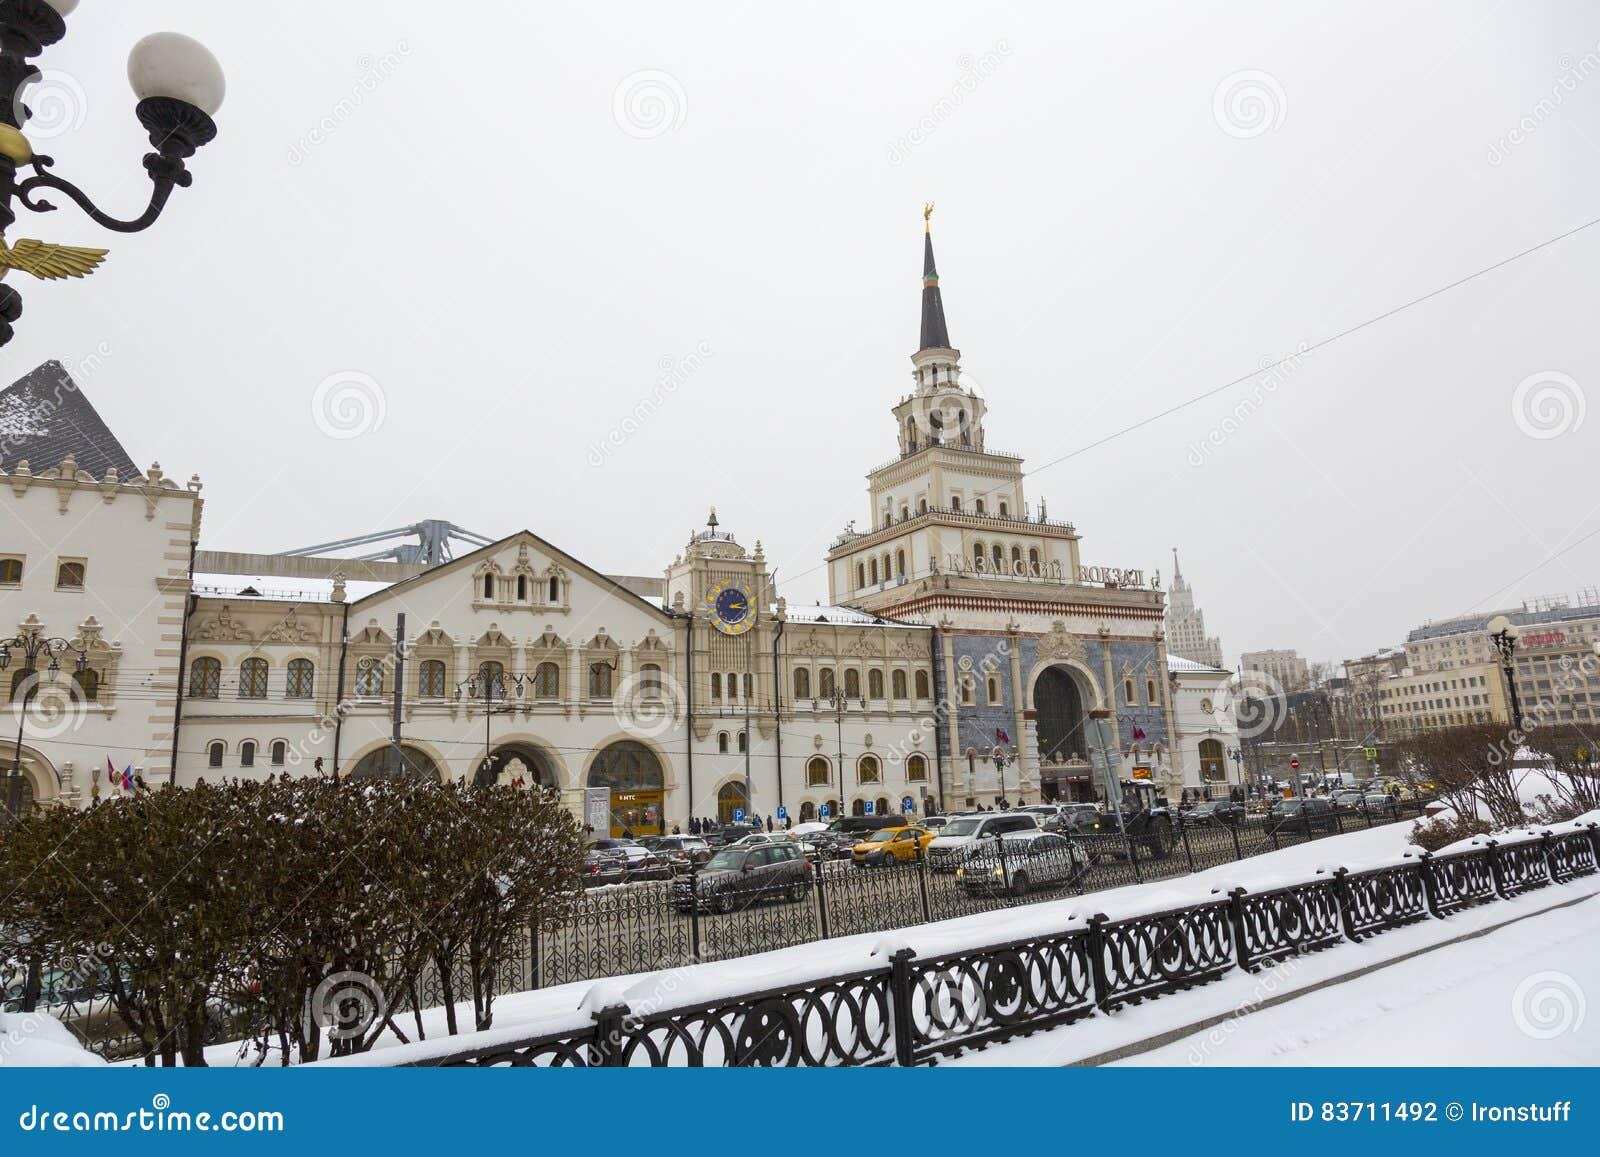 Kazansky Railway Station In Moscow Editorial Photography